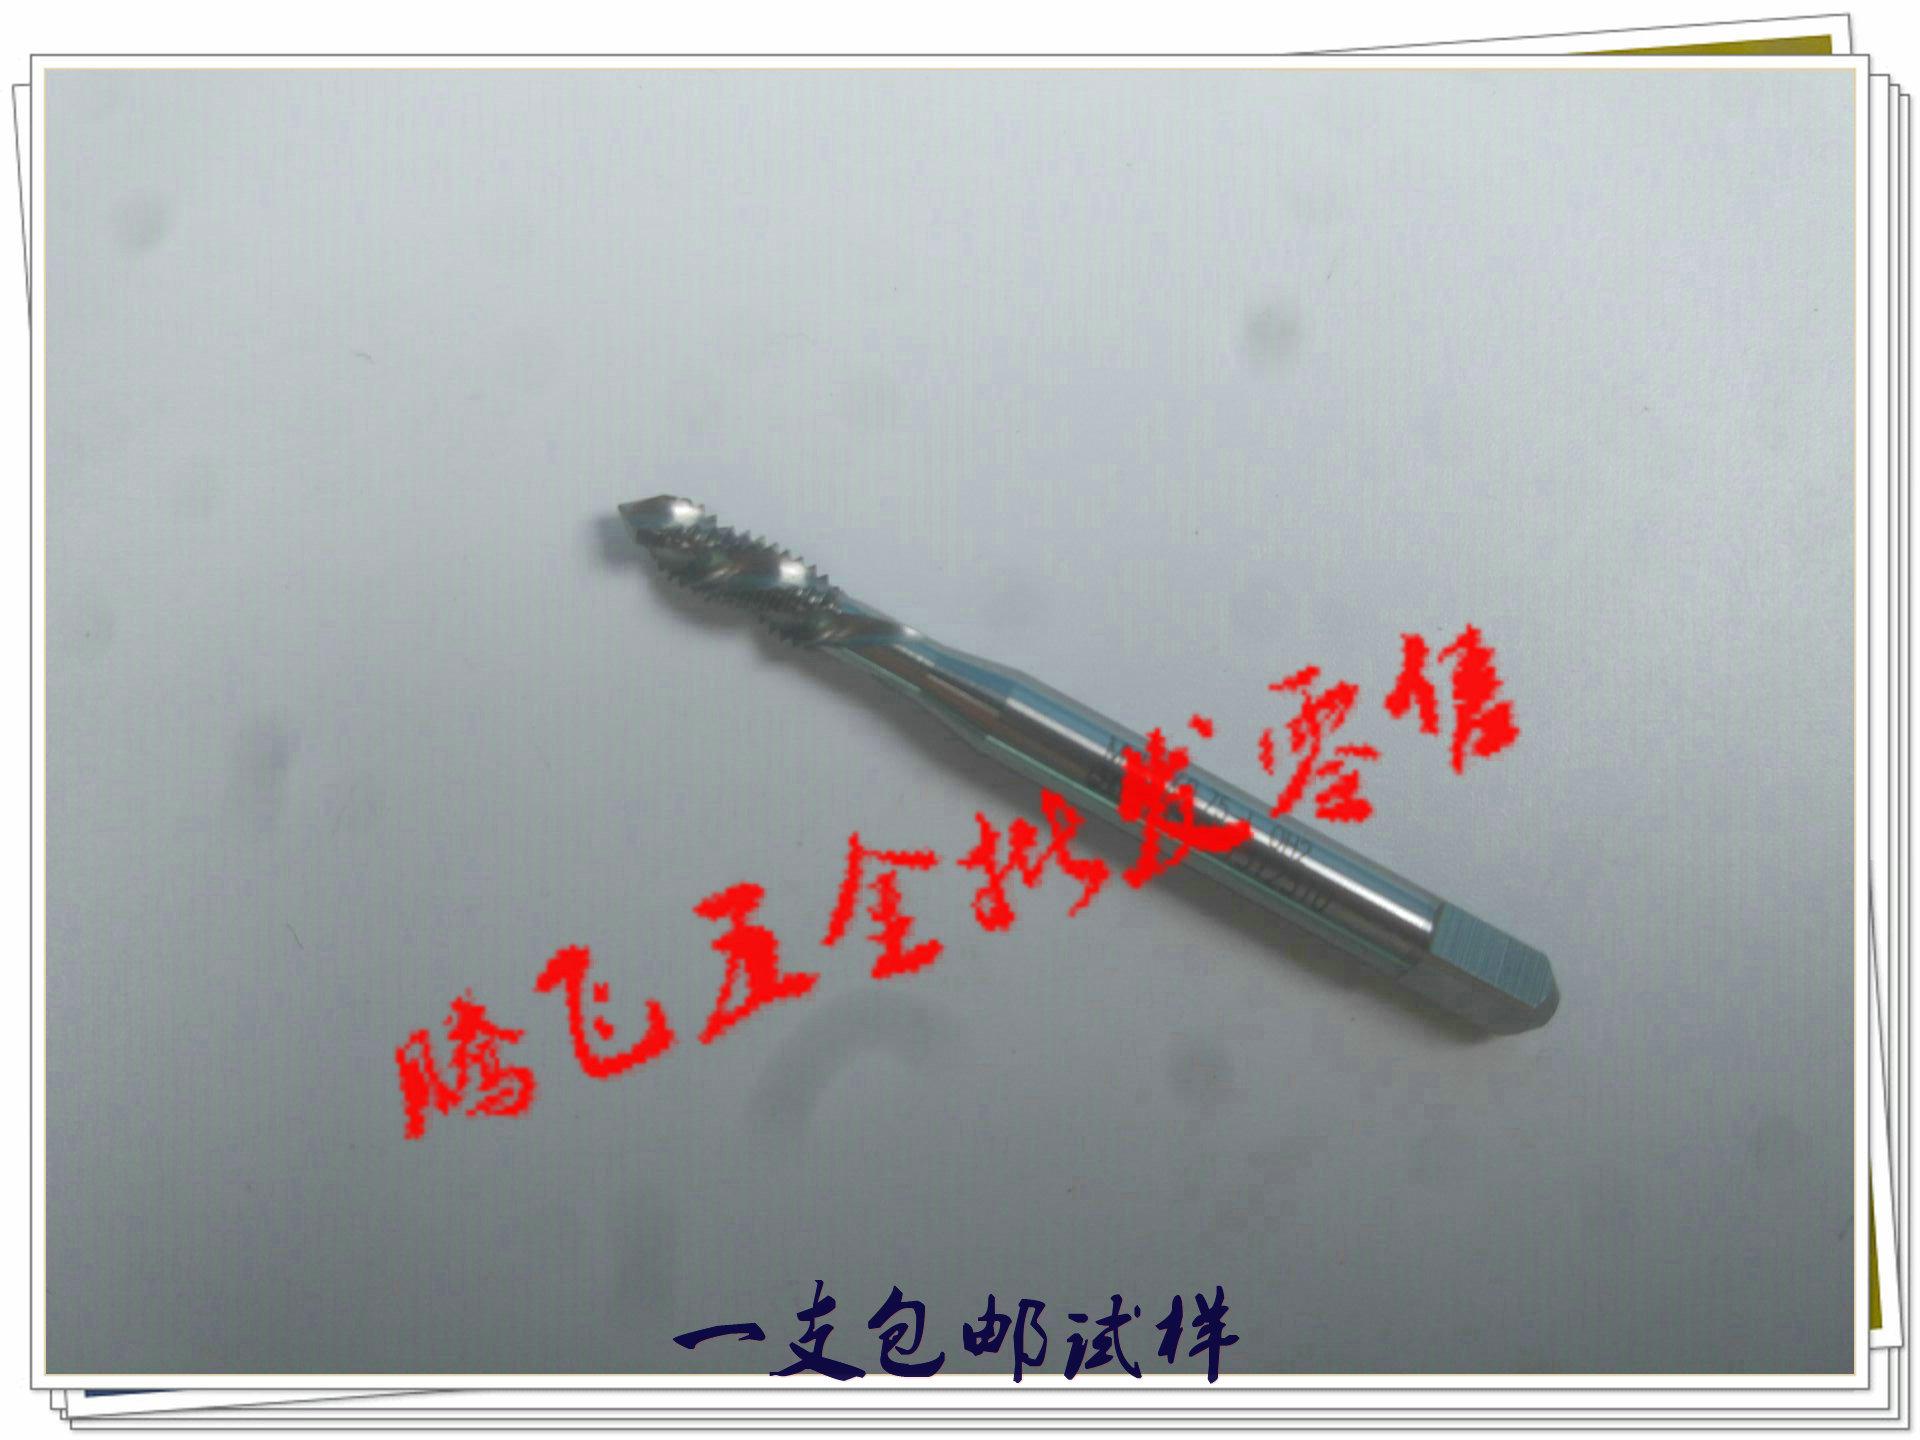 OSG left Japan fine teeth teeth attack /M5.5X0.5 machine with anti tap M3M4M5M6M7M8M9M10M12